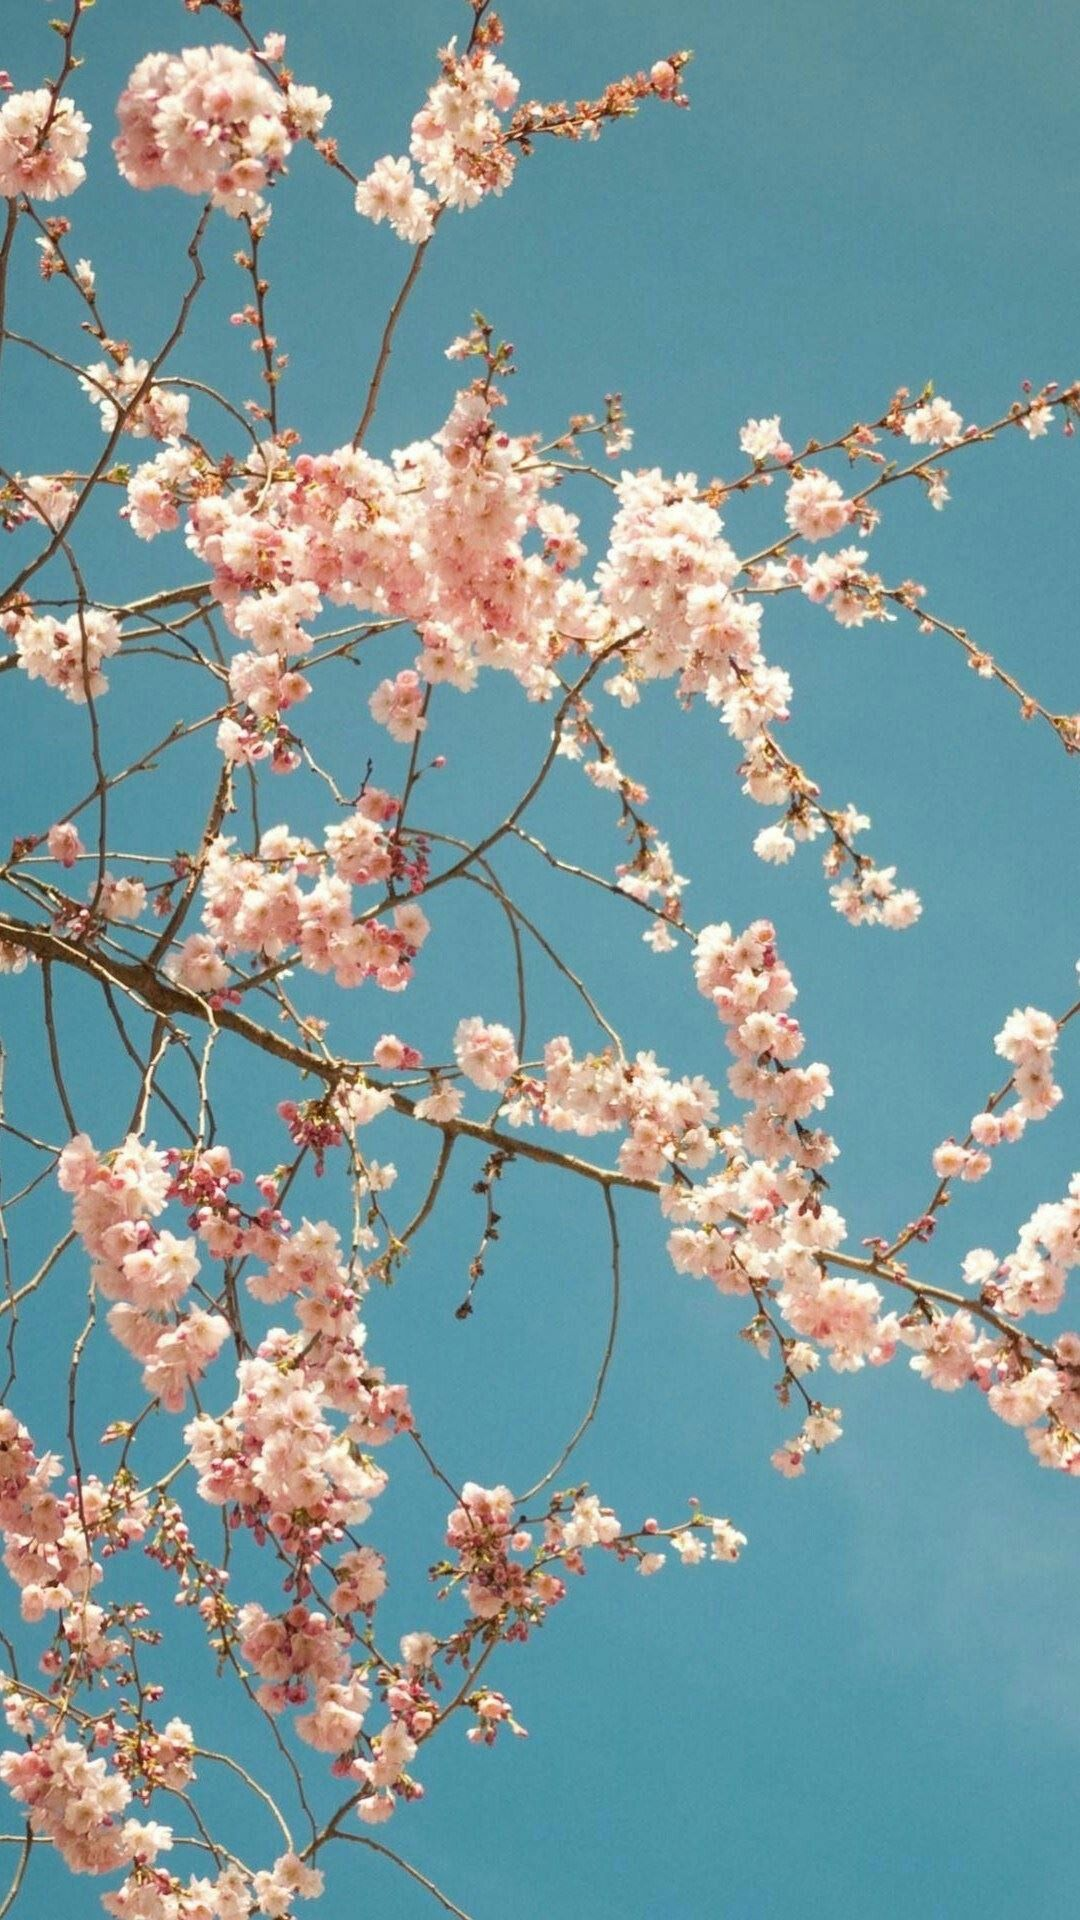 Simple Wallpaper Night Cherry Blossom - 6bf6c315c5a9eabe15f9e646db44de0a  2018.jpg